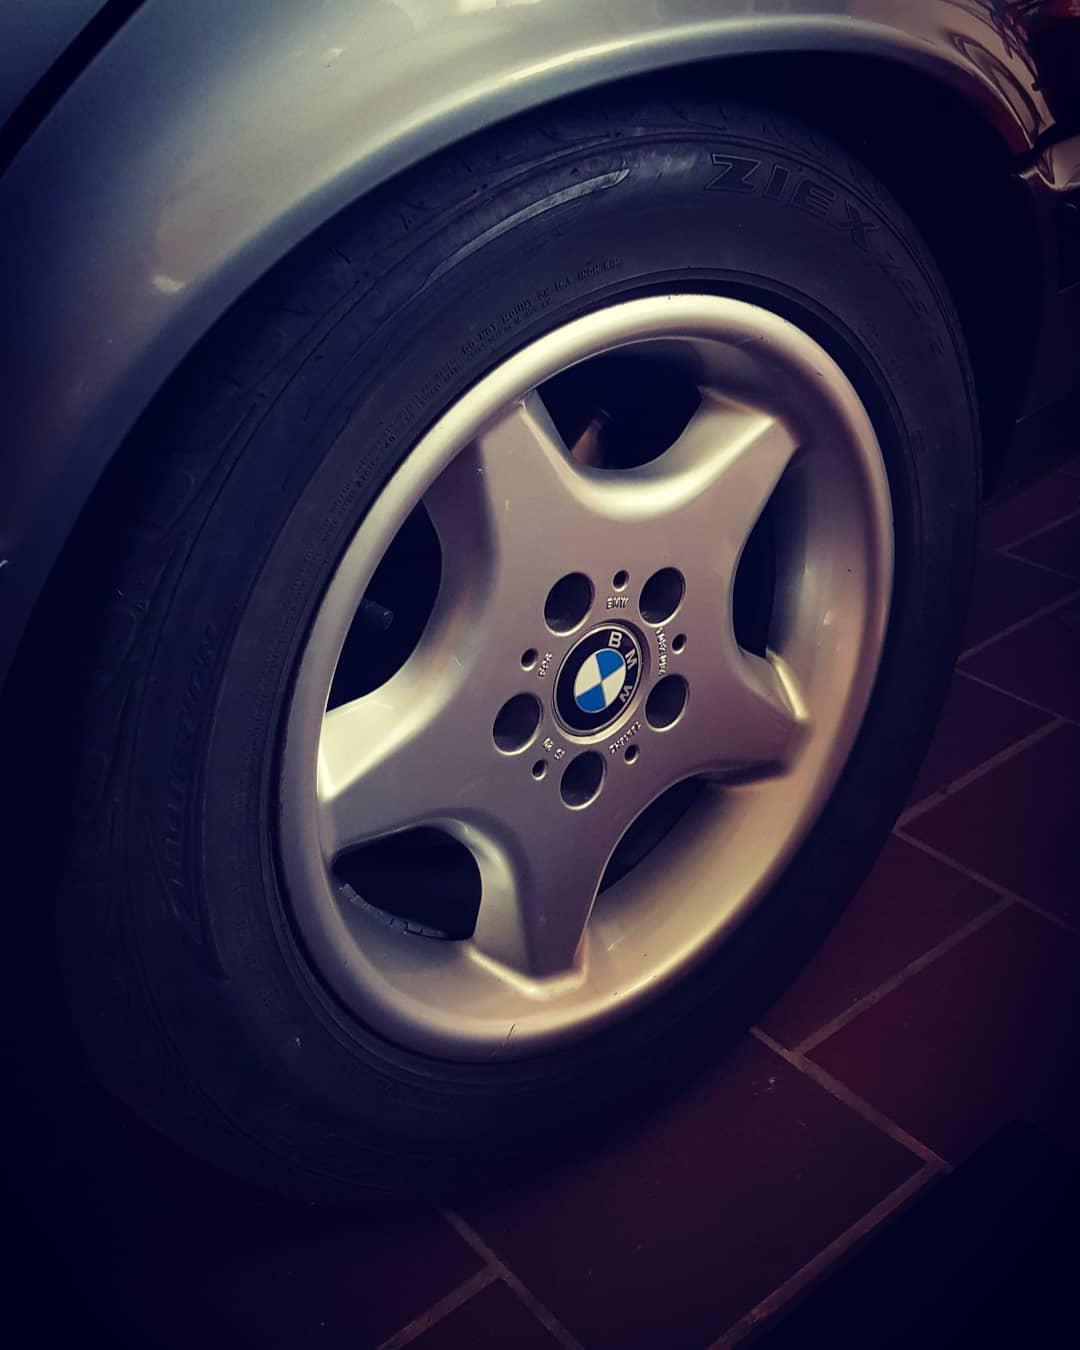 bmw style 16 wheels